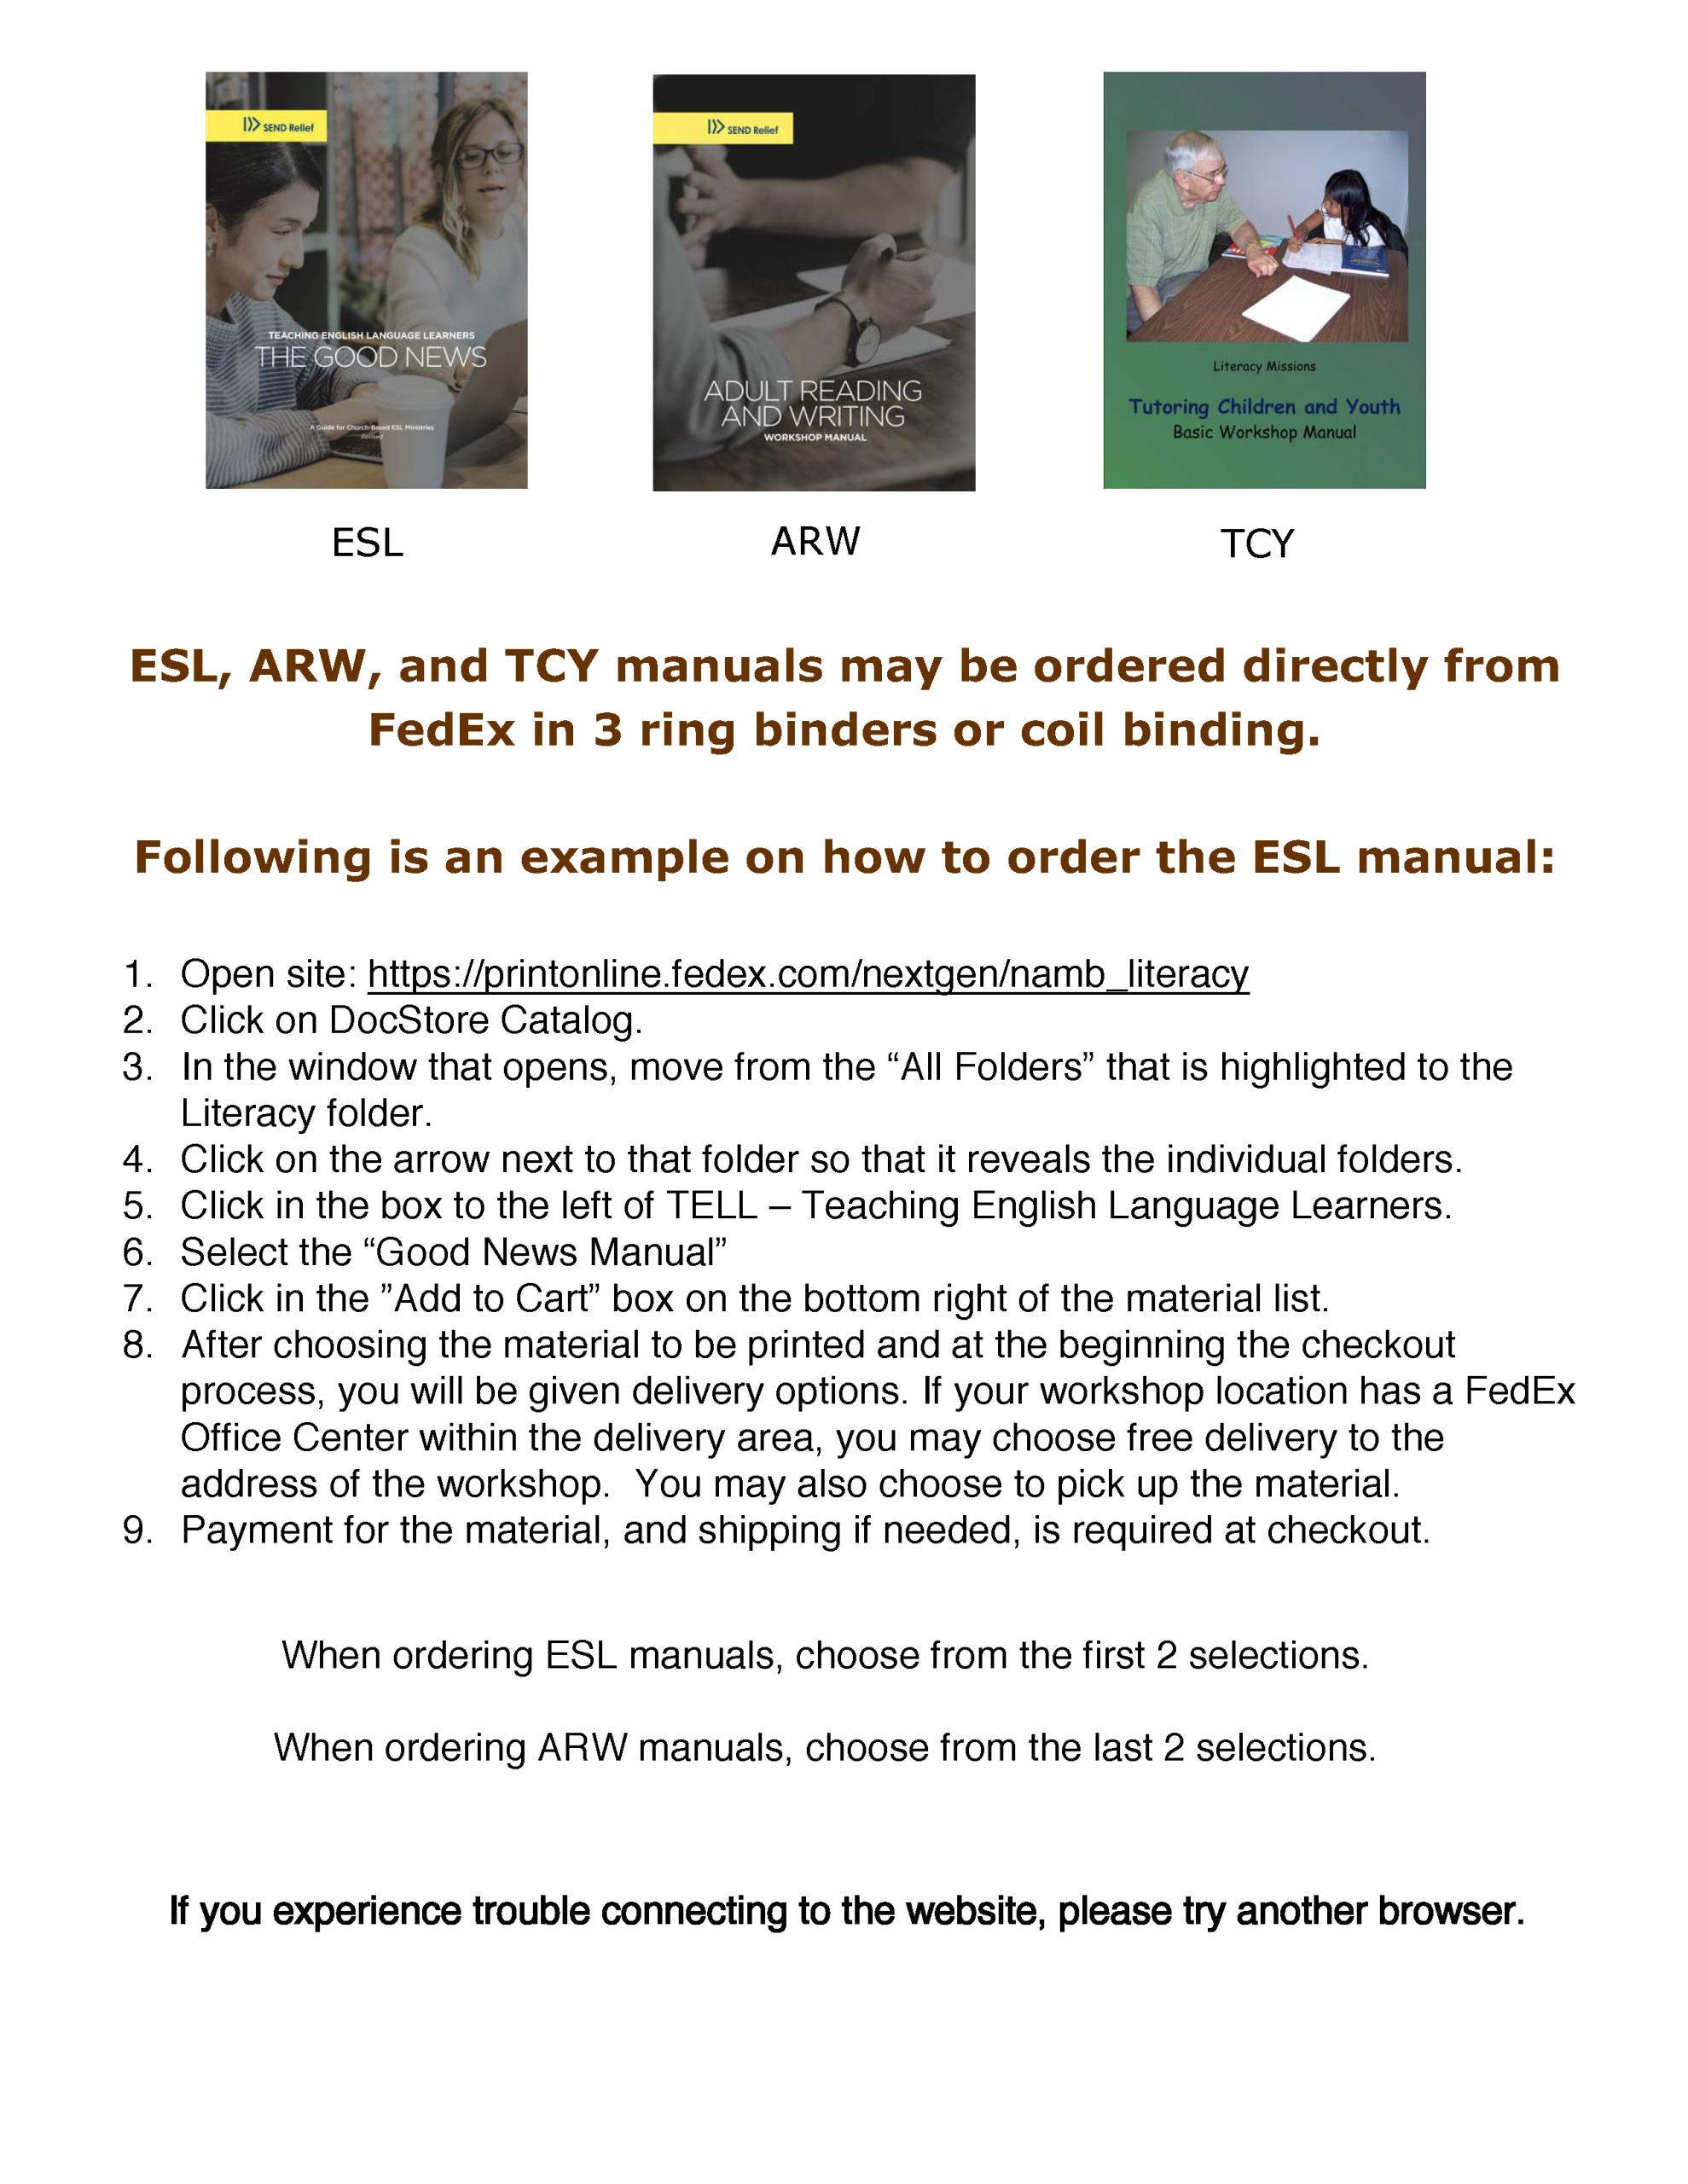 TELL Manual, Community Ministries, ESL, ELS Manual